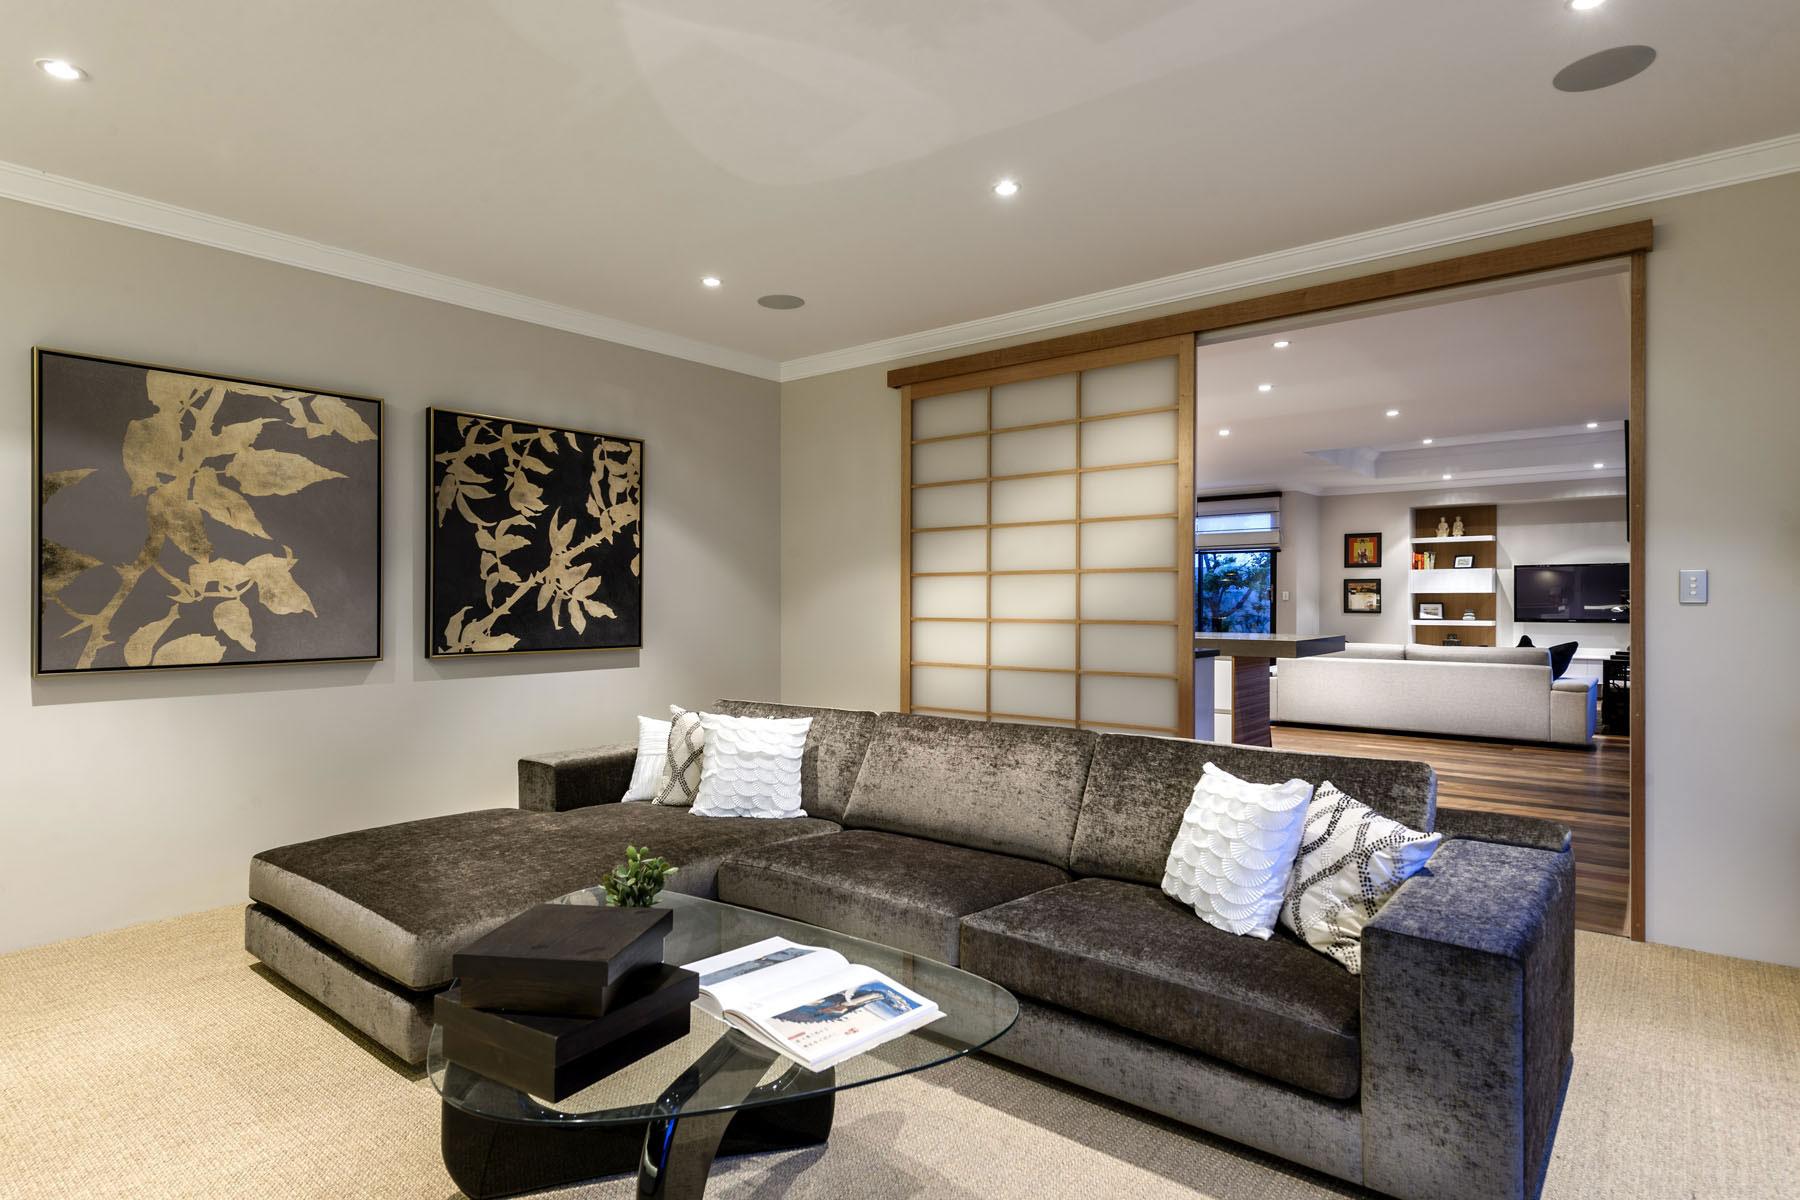 Sofa, Glass Coffee Table, Art, House in Burns Beach, Perth